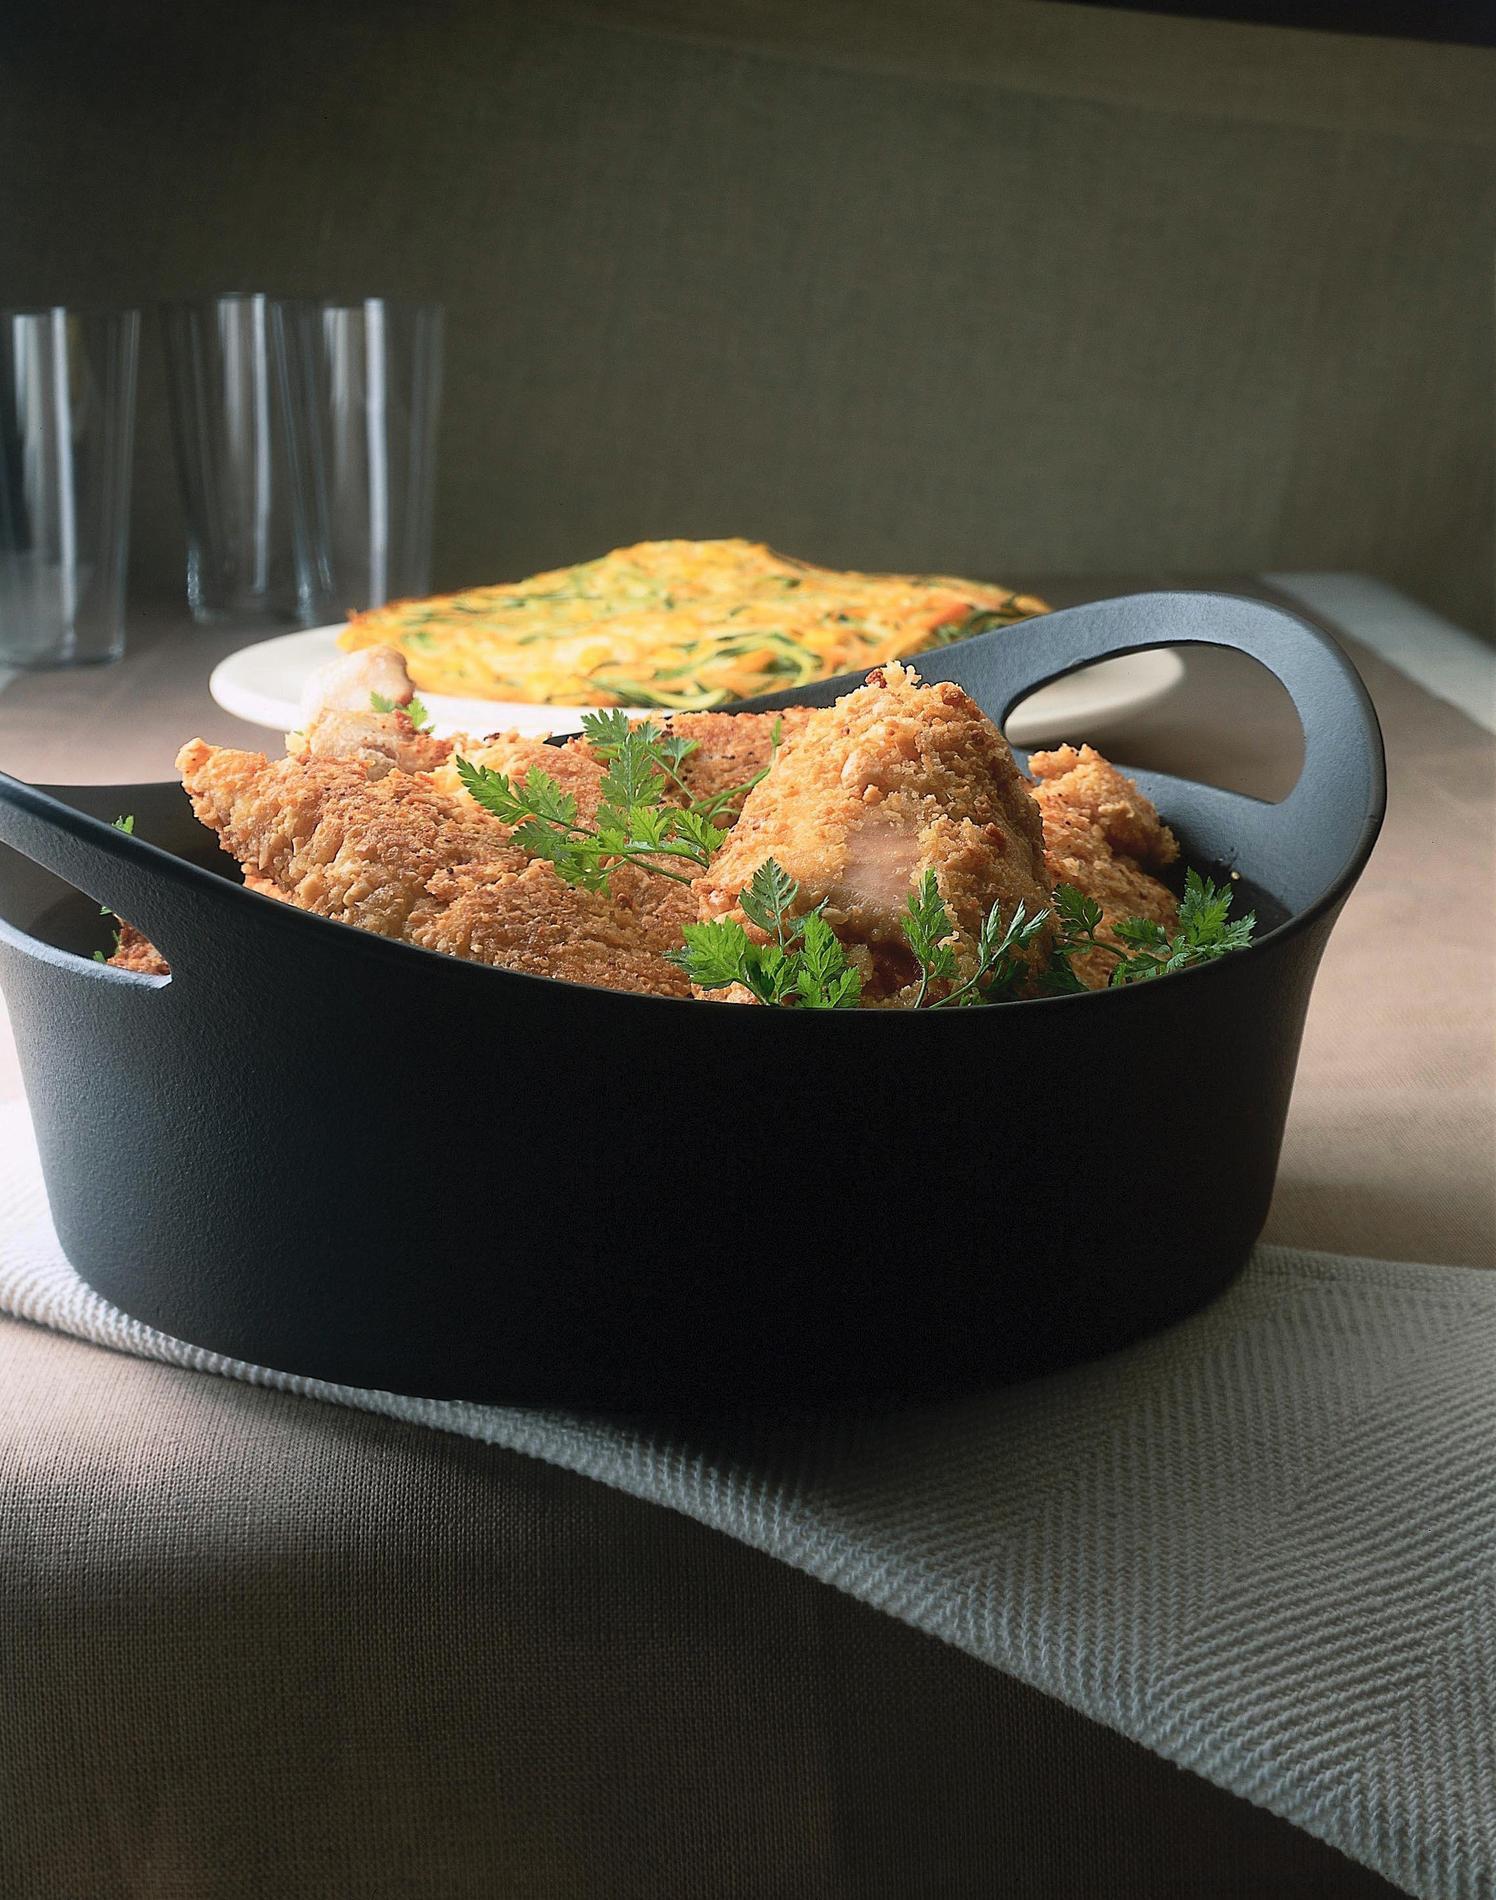 recette poulet pan aux cacahu tes cuisine madame figaro. Black Bedroom Furniture Sets. Home Design Ideas